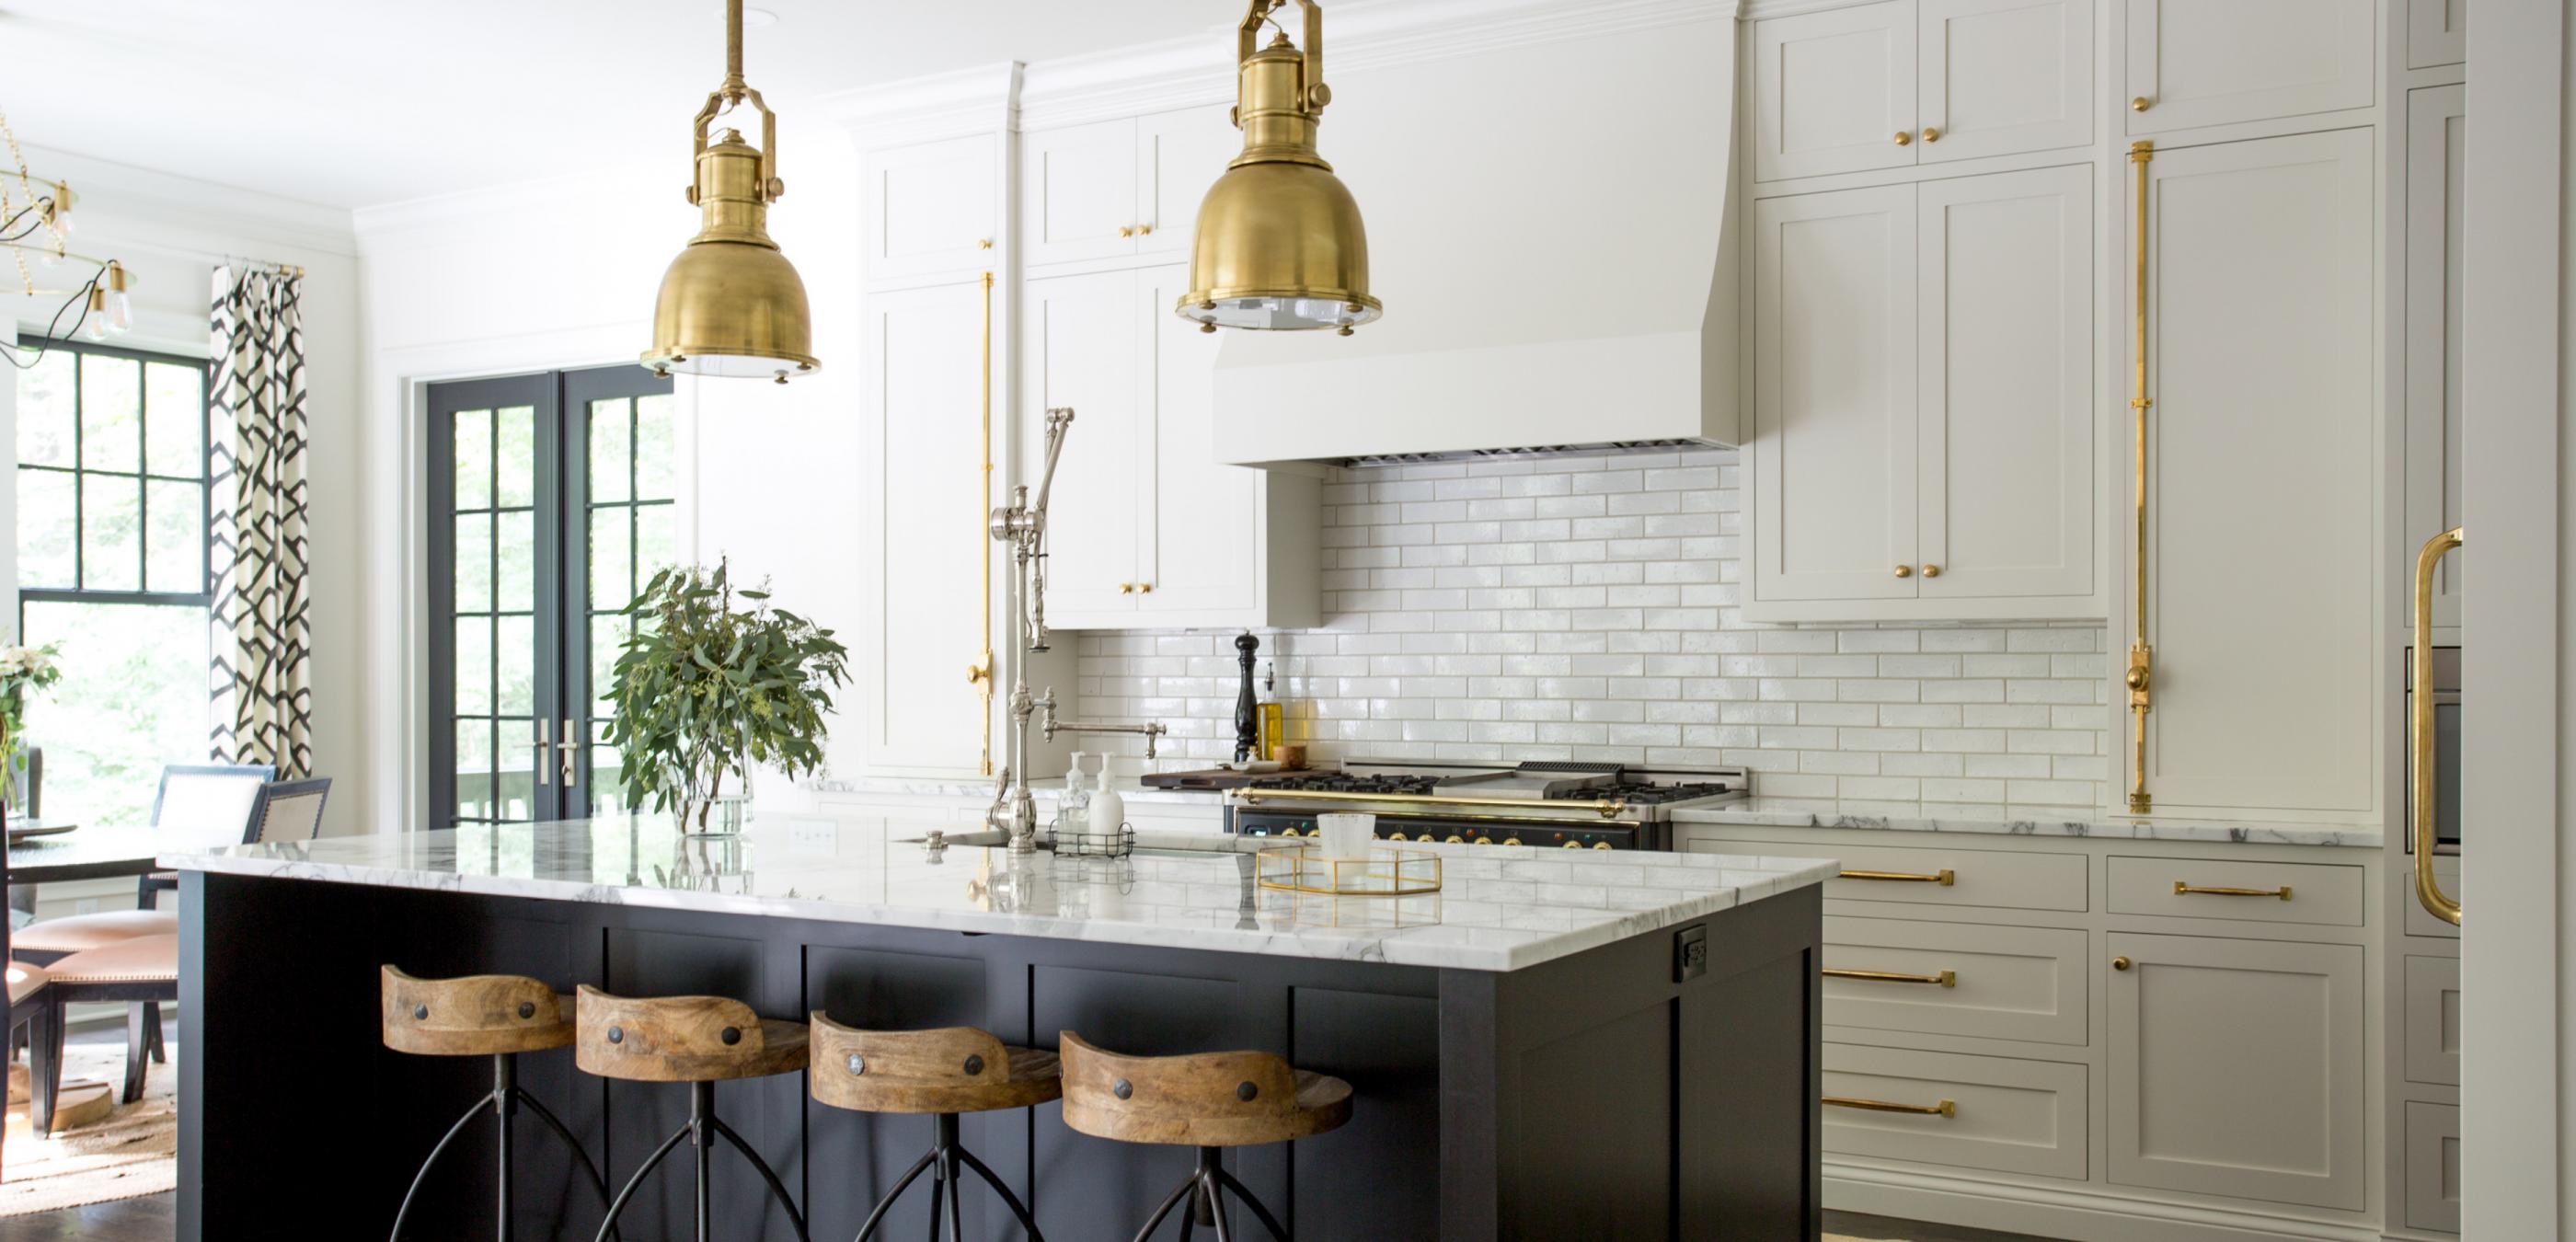 black and white kitchen, classic kitchen, marble, brass pendants